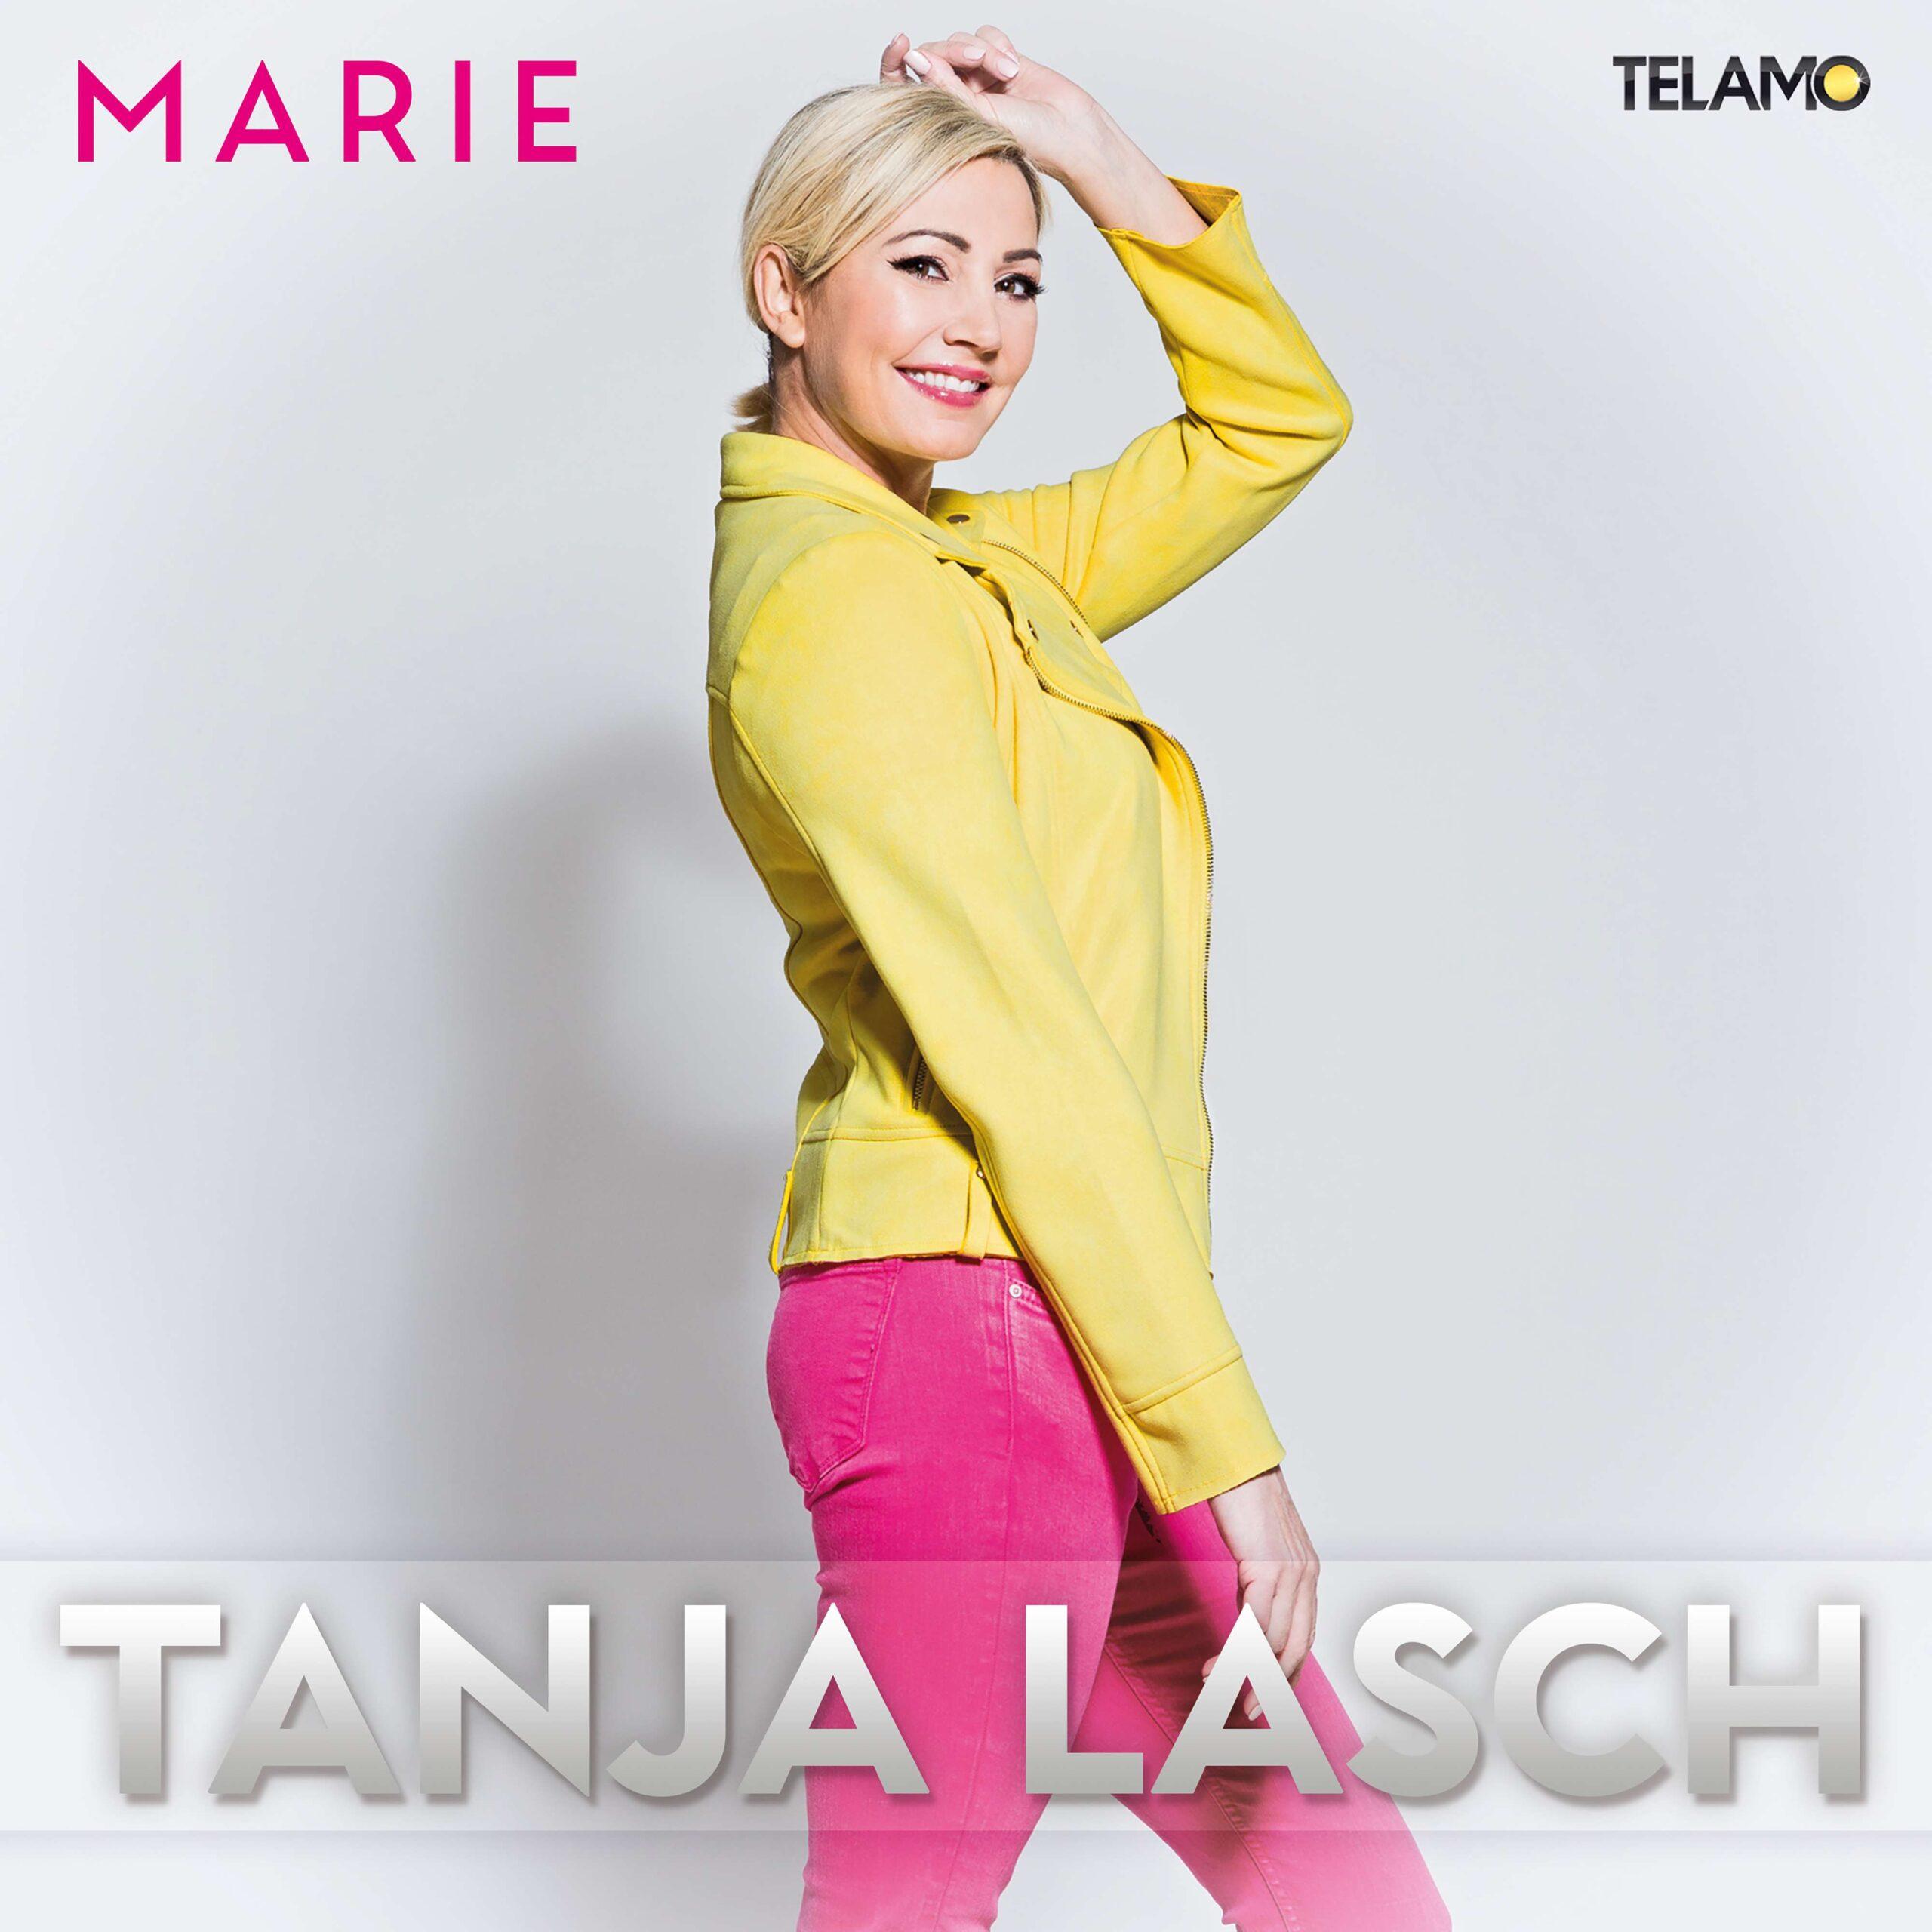 Tanja Lasch - Marie (2021)